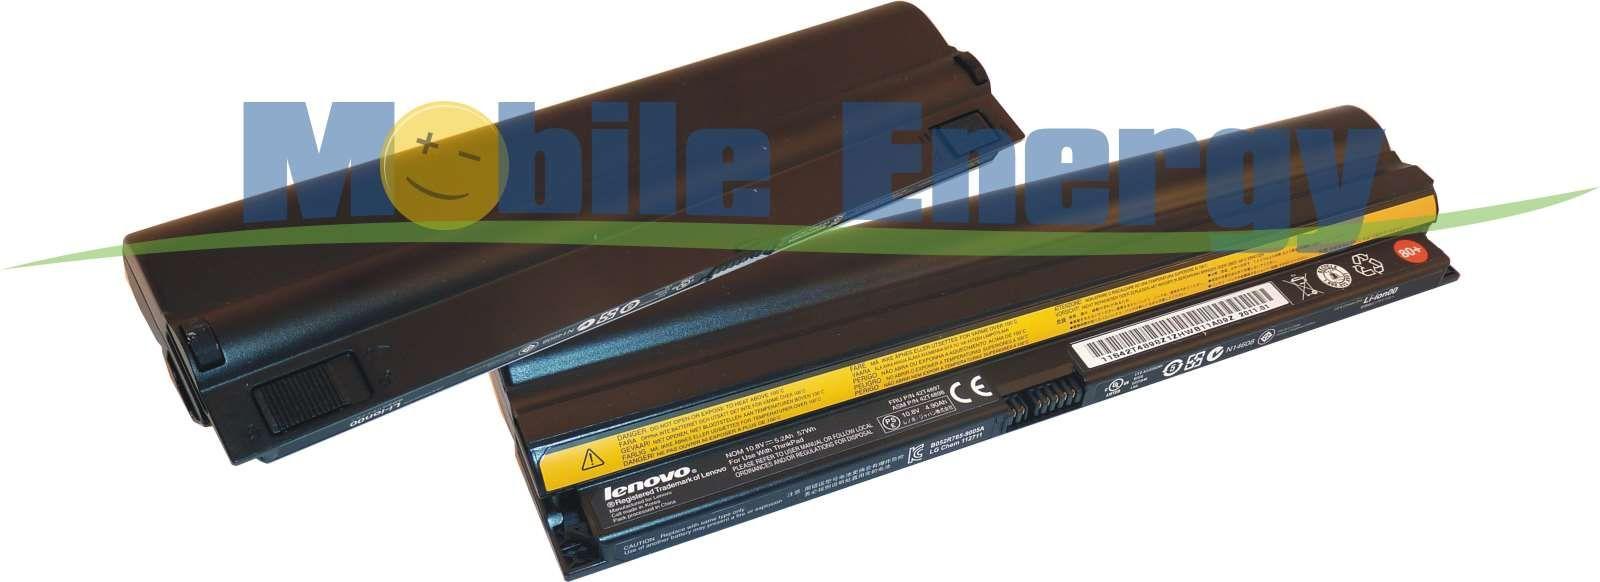 Mobile-Energy Baterie Lenovo ThinkPad Edge 11 / ThinkPad X100e /